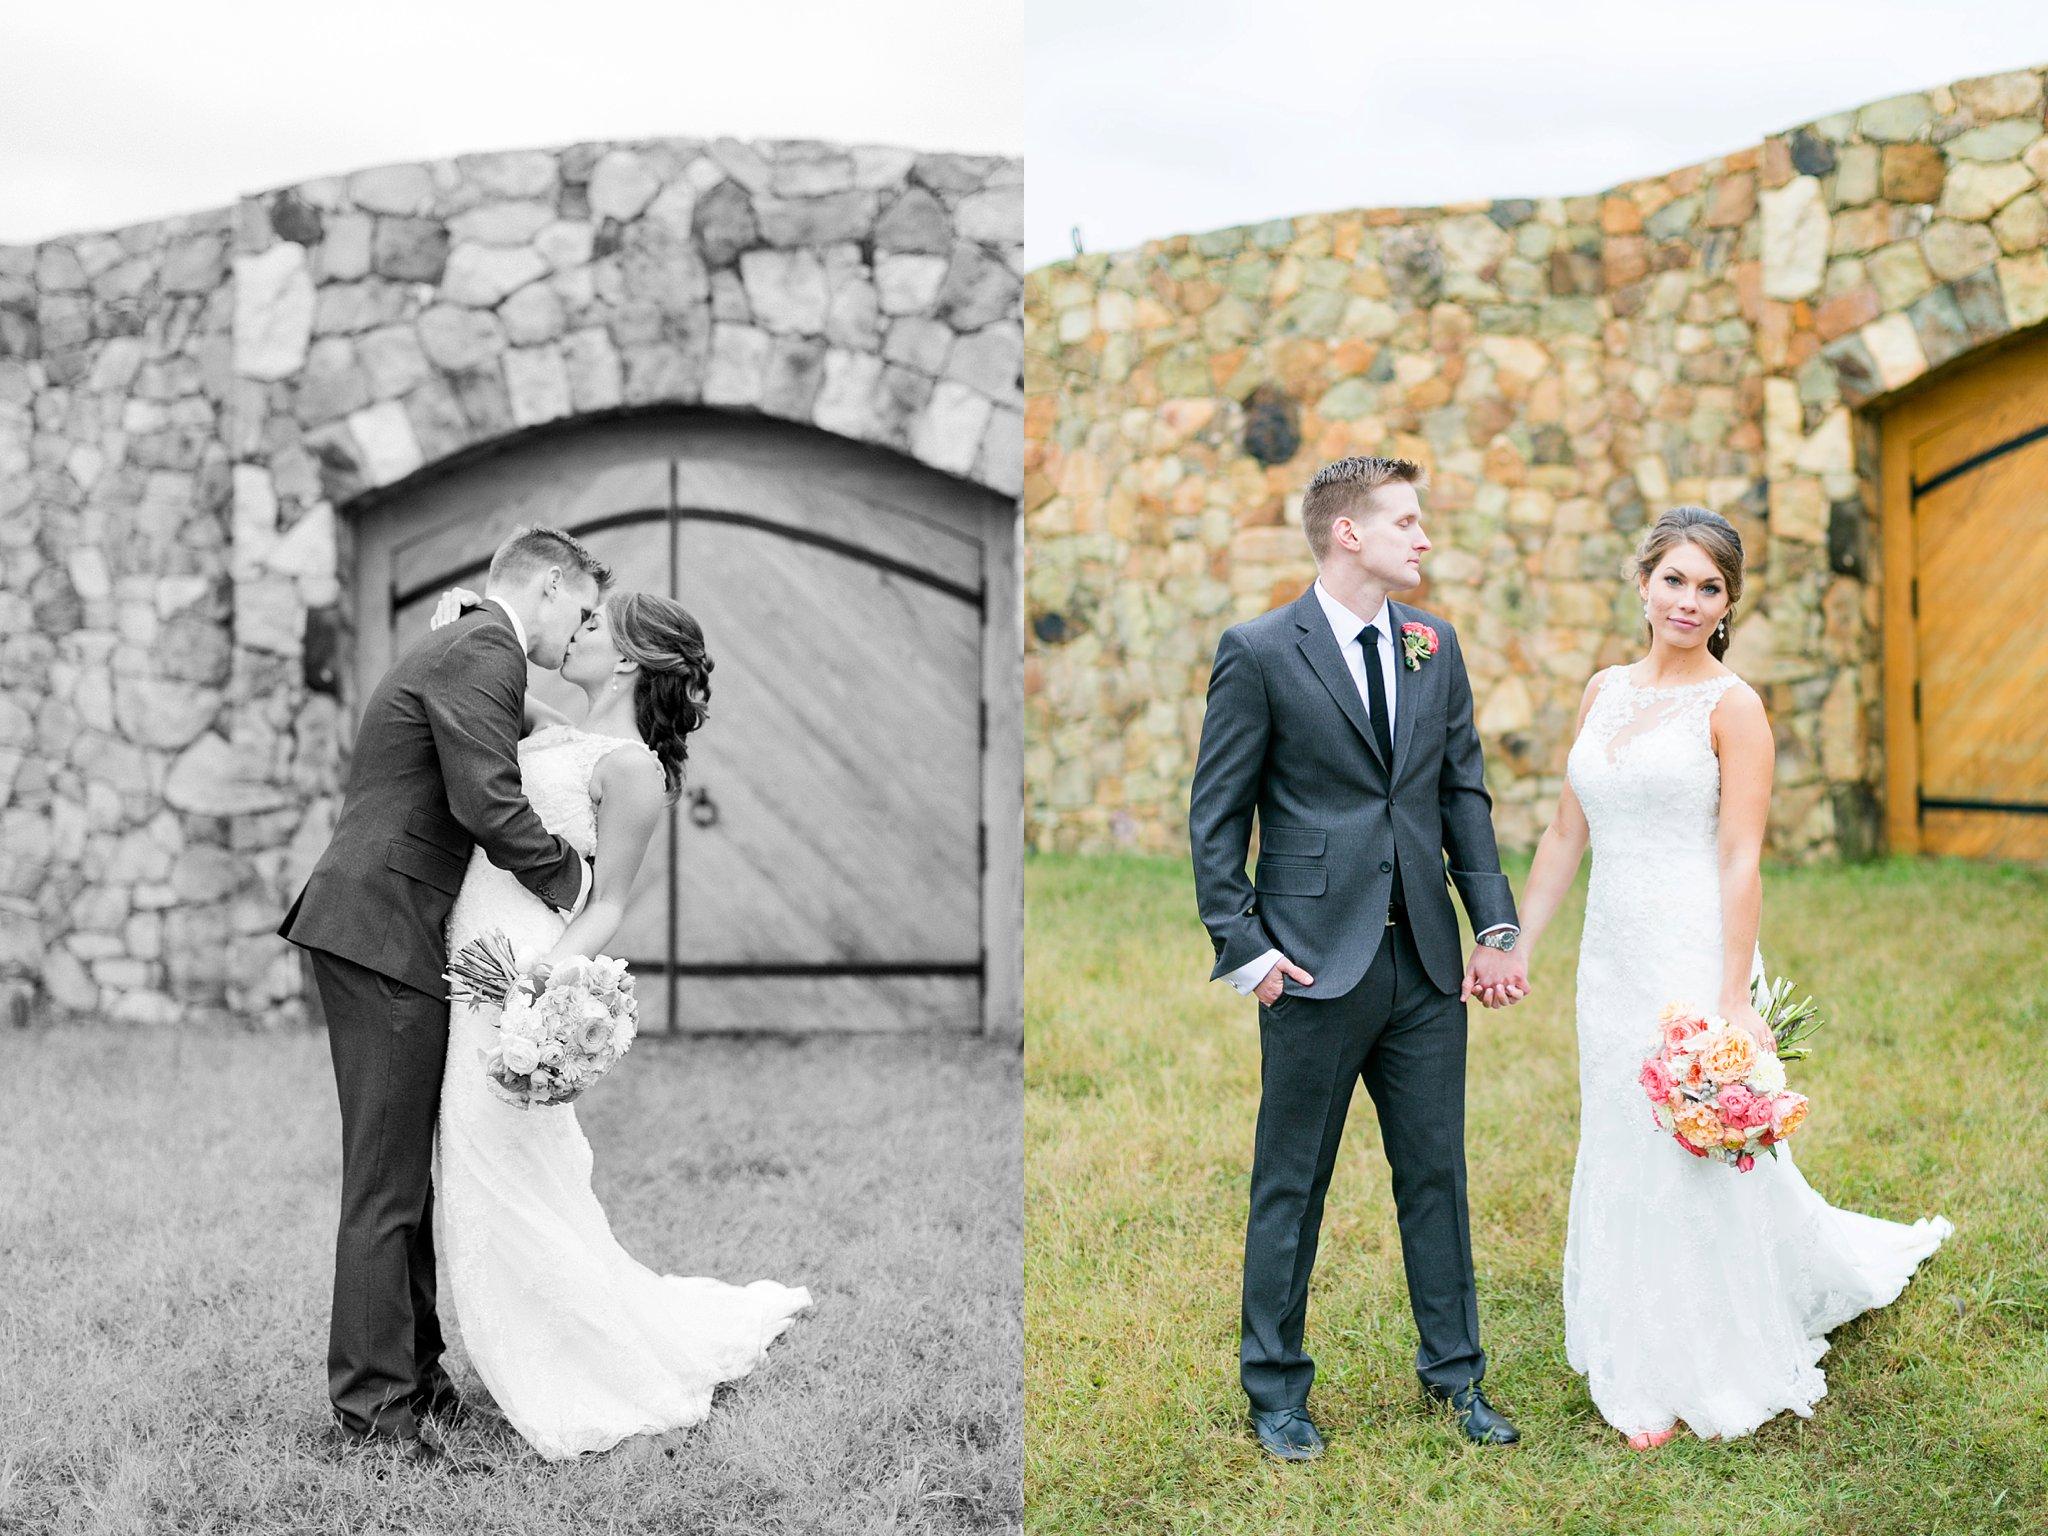 Stone Tower Winery Wedding Photos Virginia Wedding Photographer Megan Kelsey Photography Sam & Angela-258.jpg